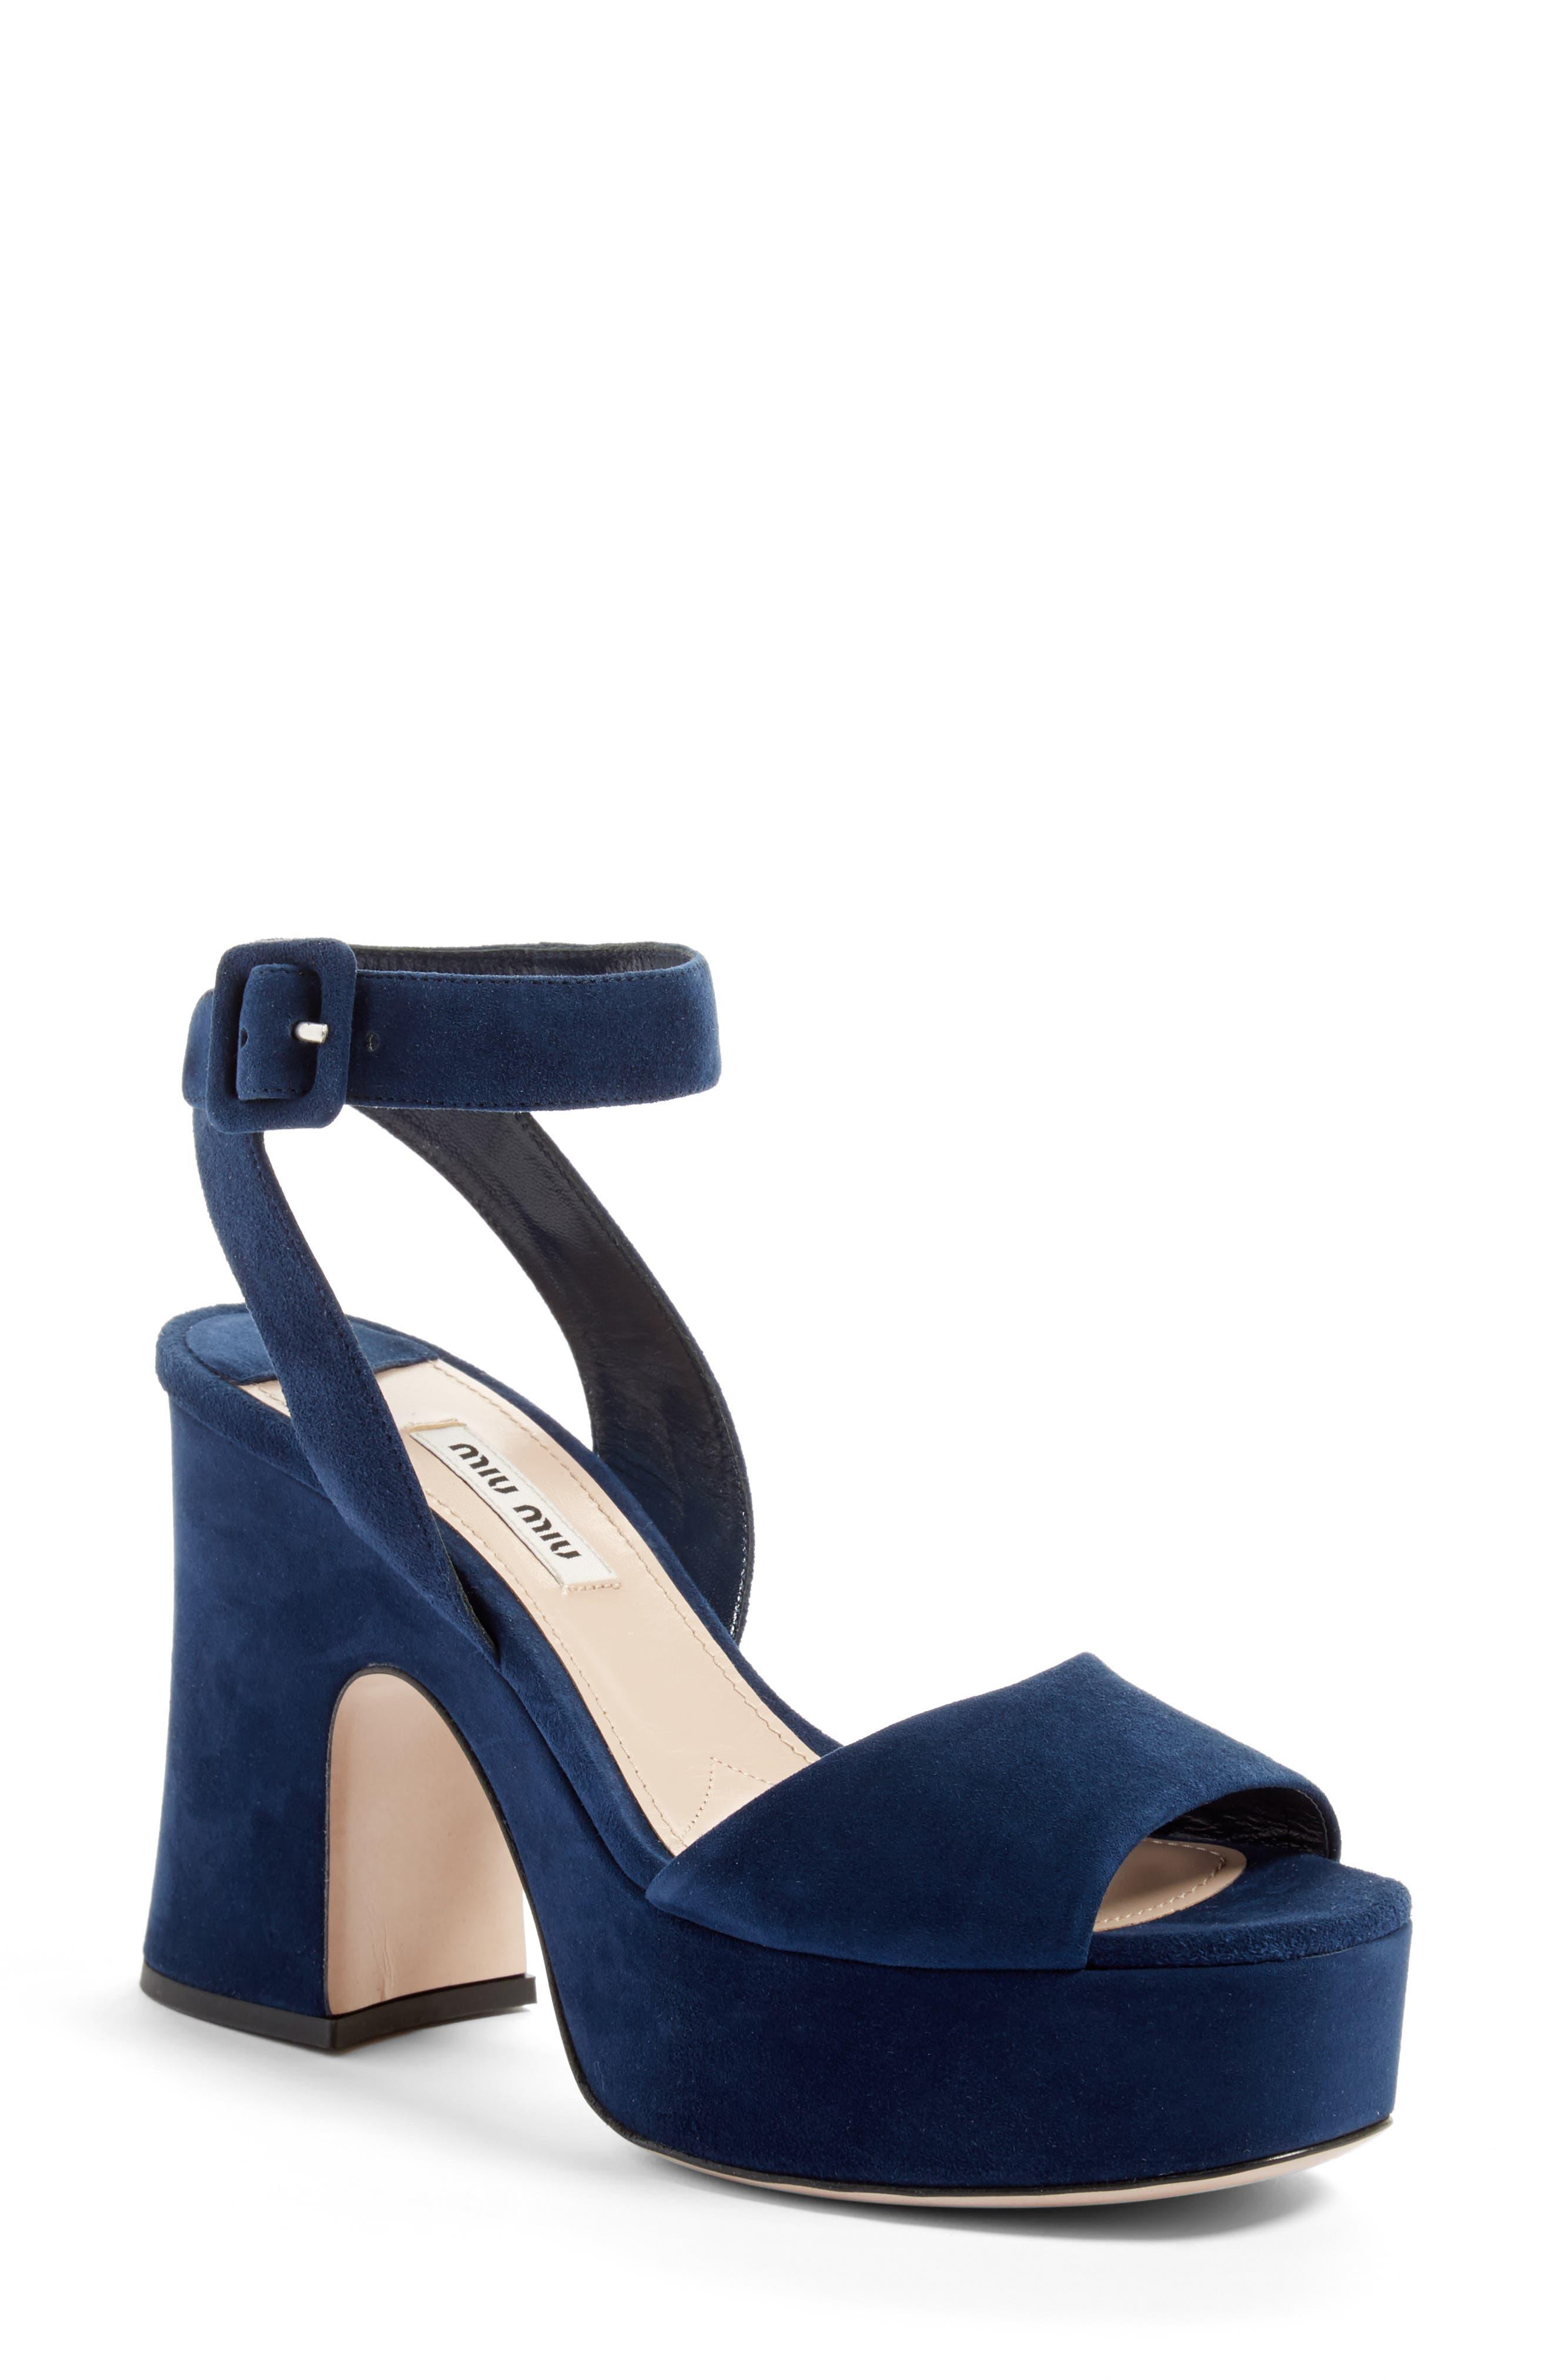 Alternate Image 1 Selected - Miu Miu Platform Strap Sandal (Women)